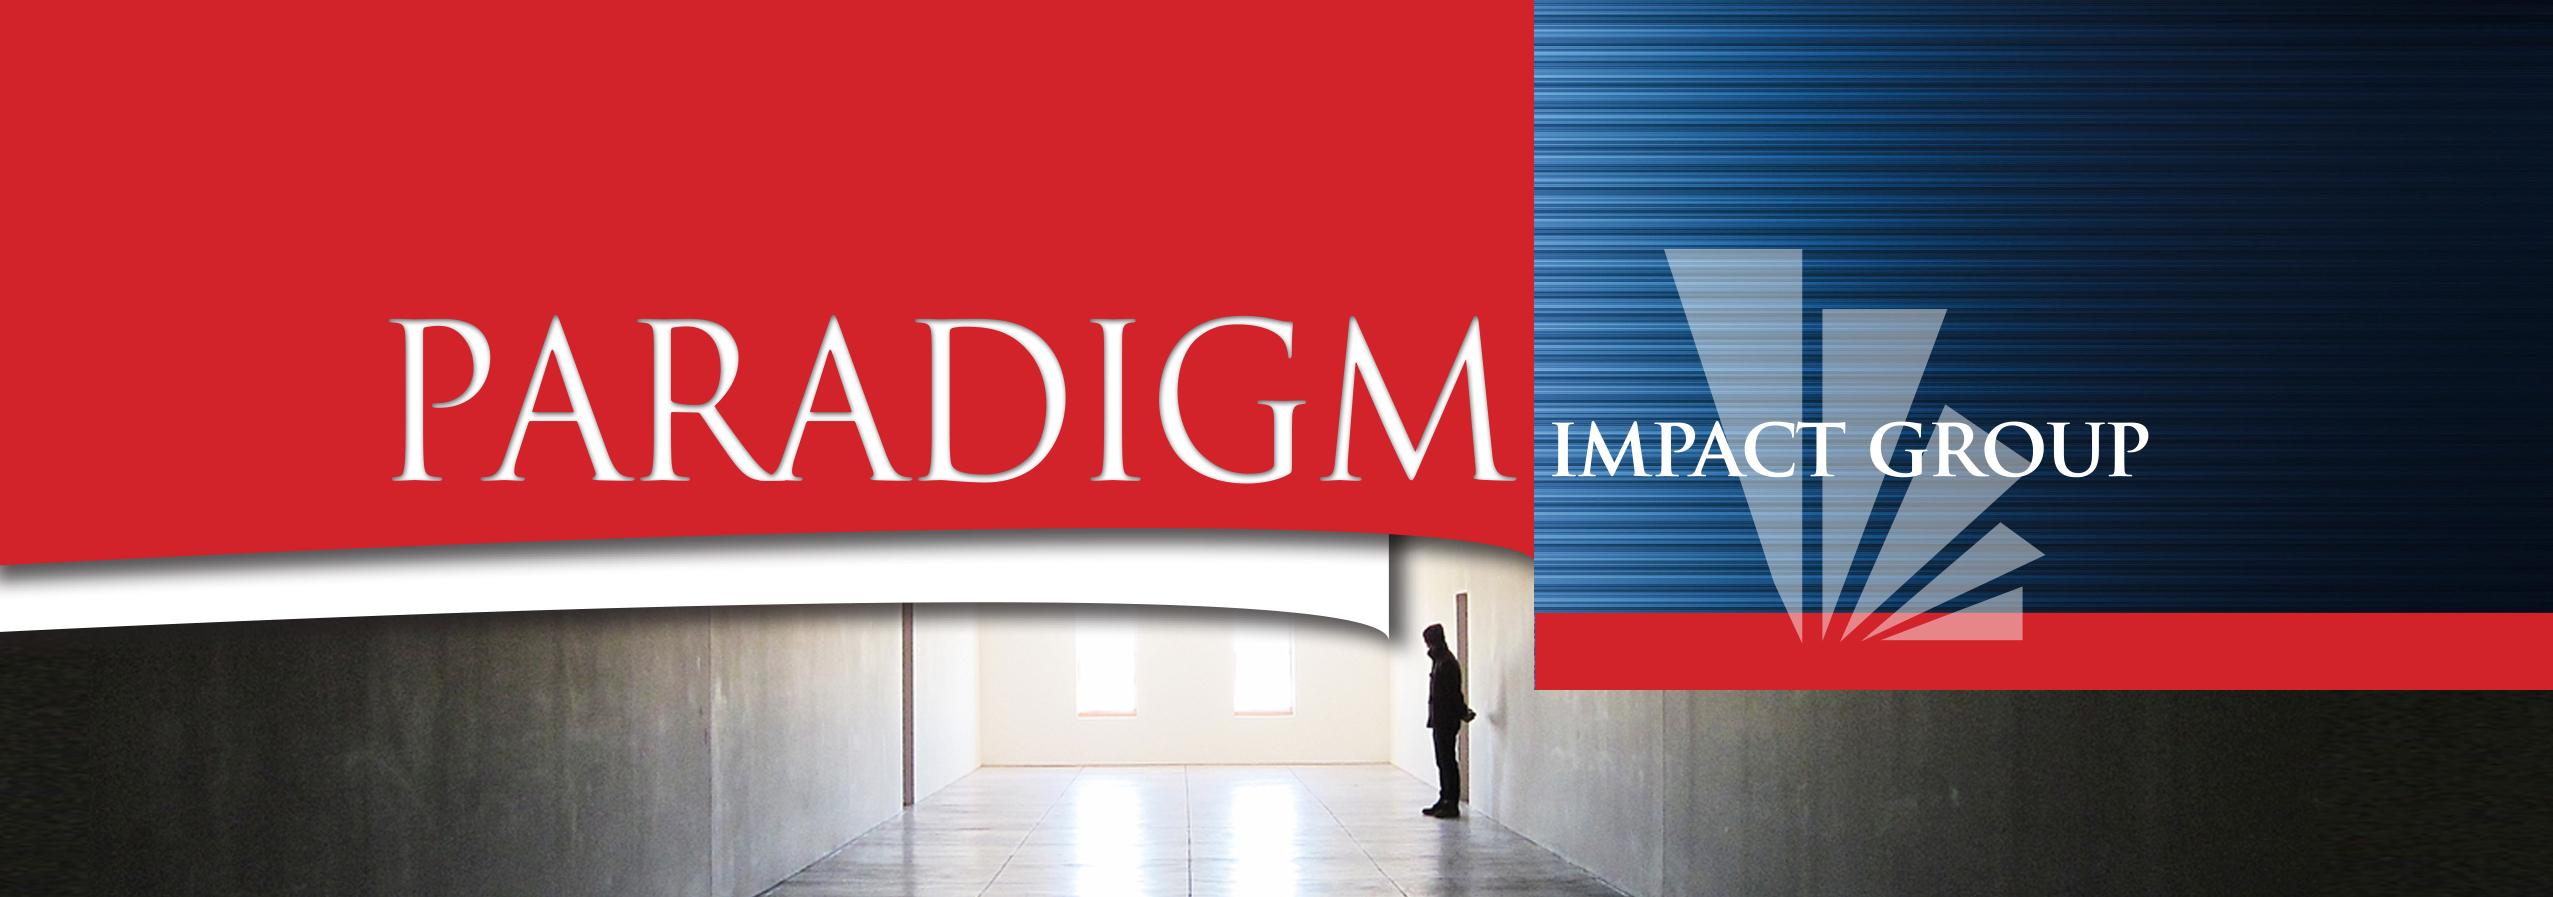 Paradigm Impact Group